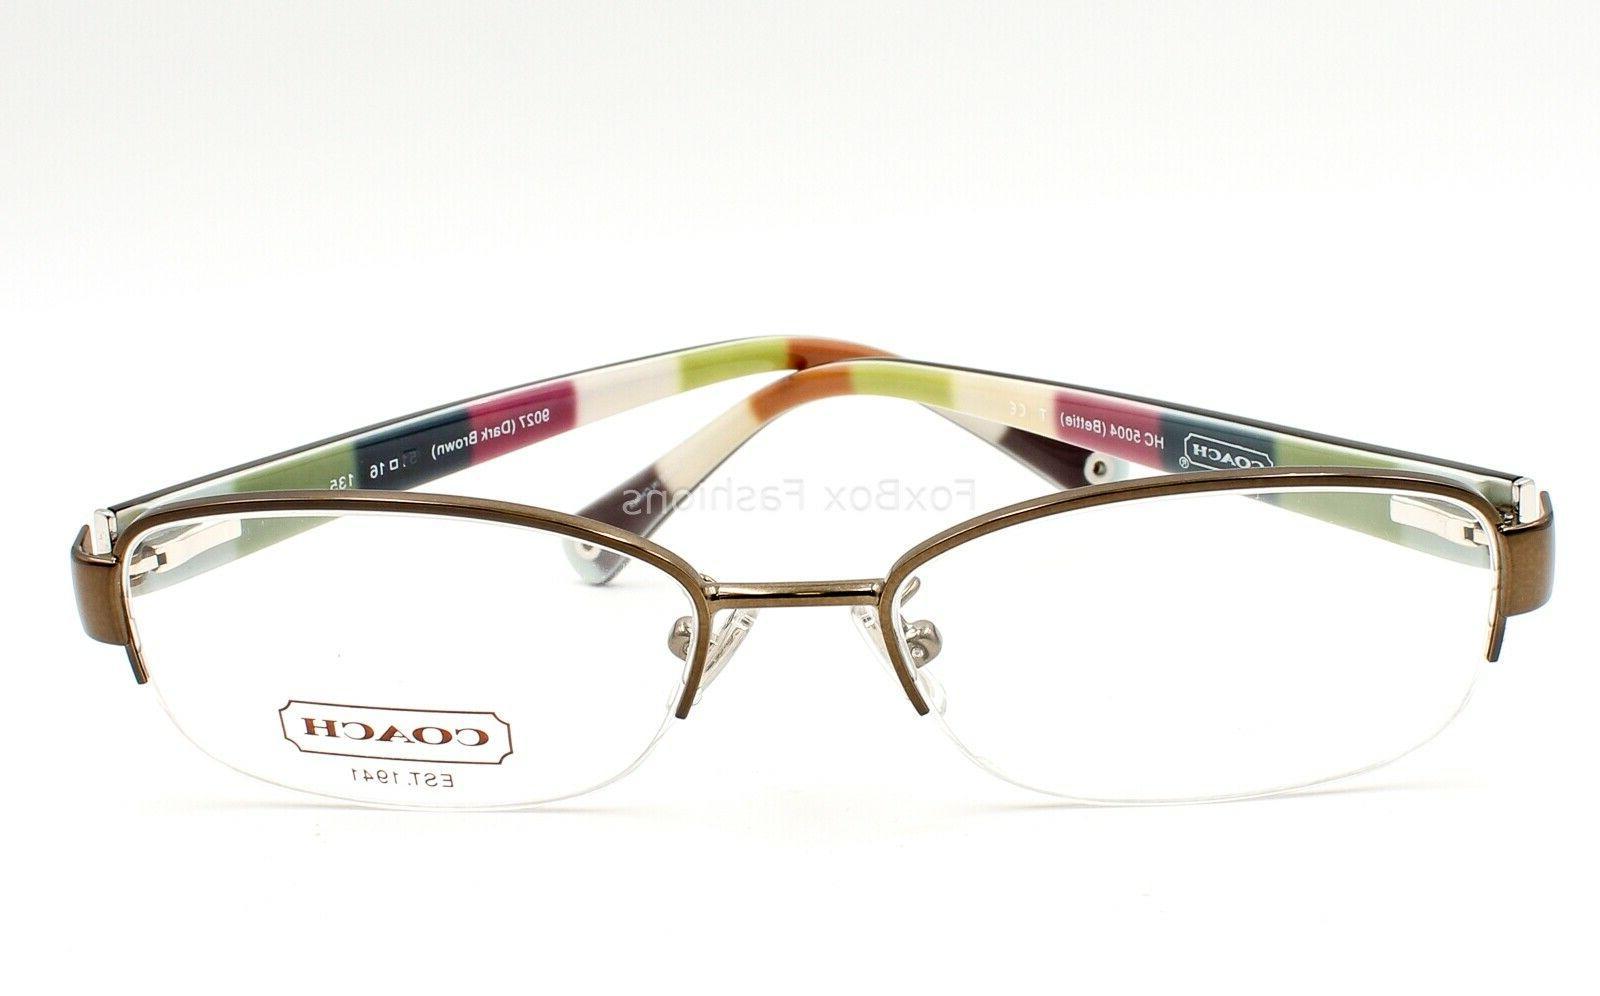 Coach HC Bettie Half Rimless Eyeglasses Frames Glasses